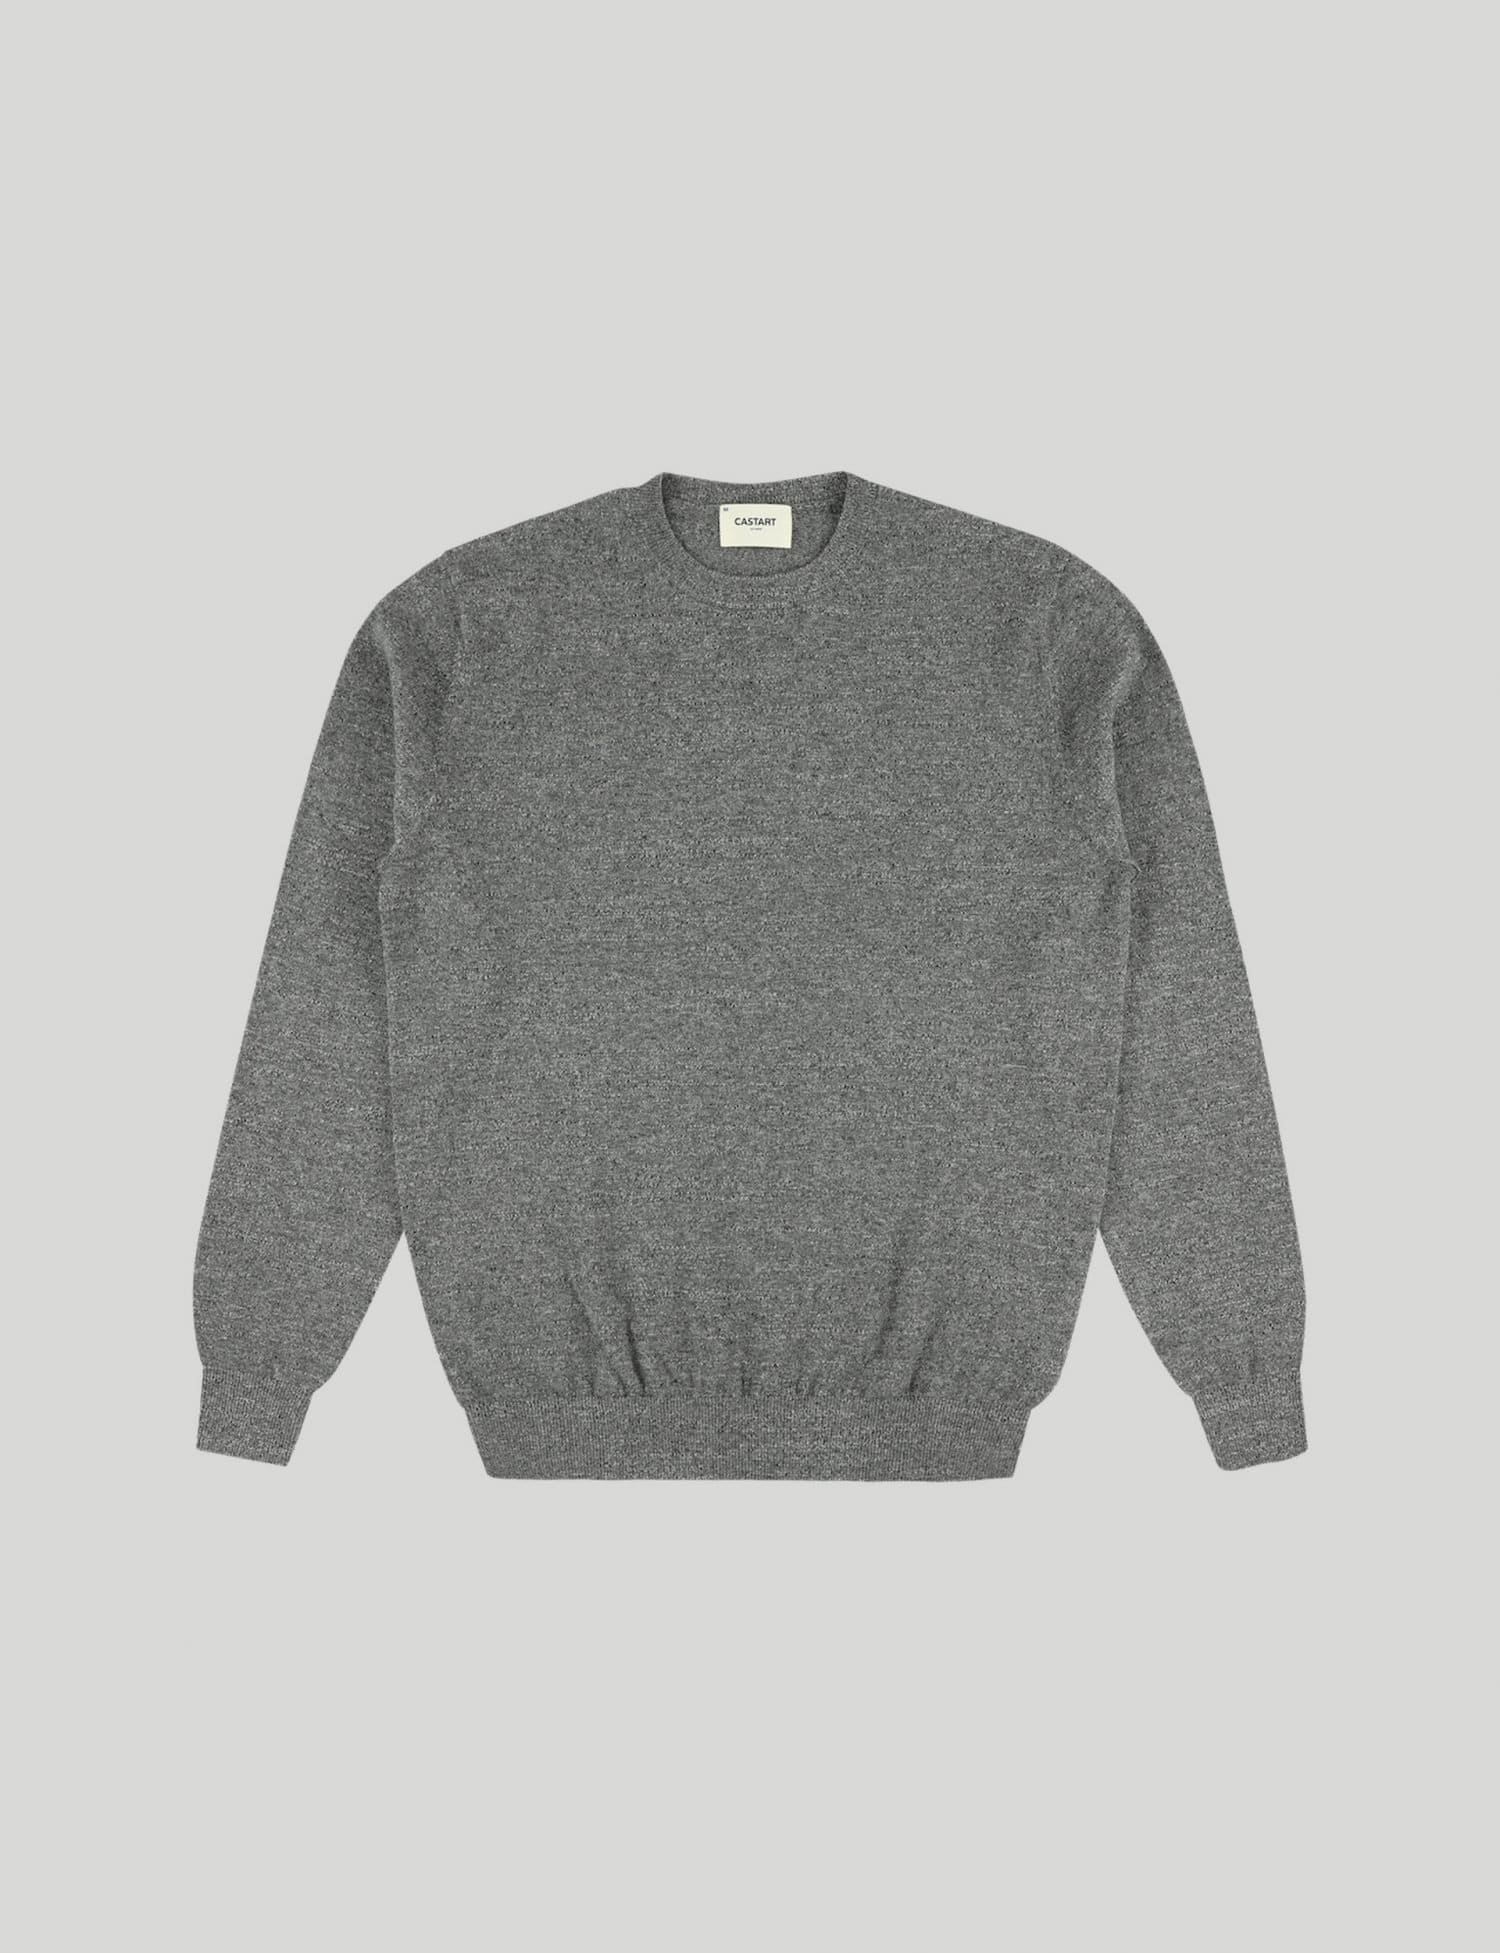 Castart - Heckel Knitwear - Grey